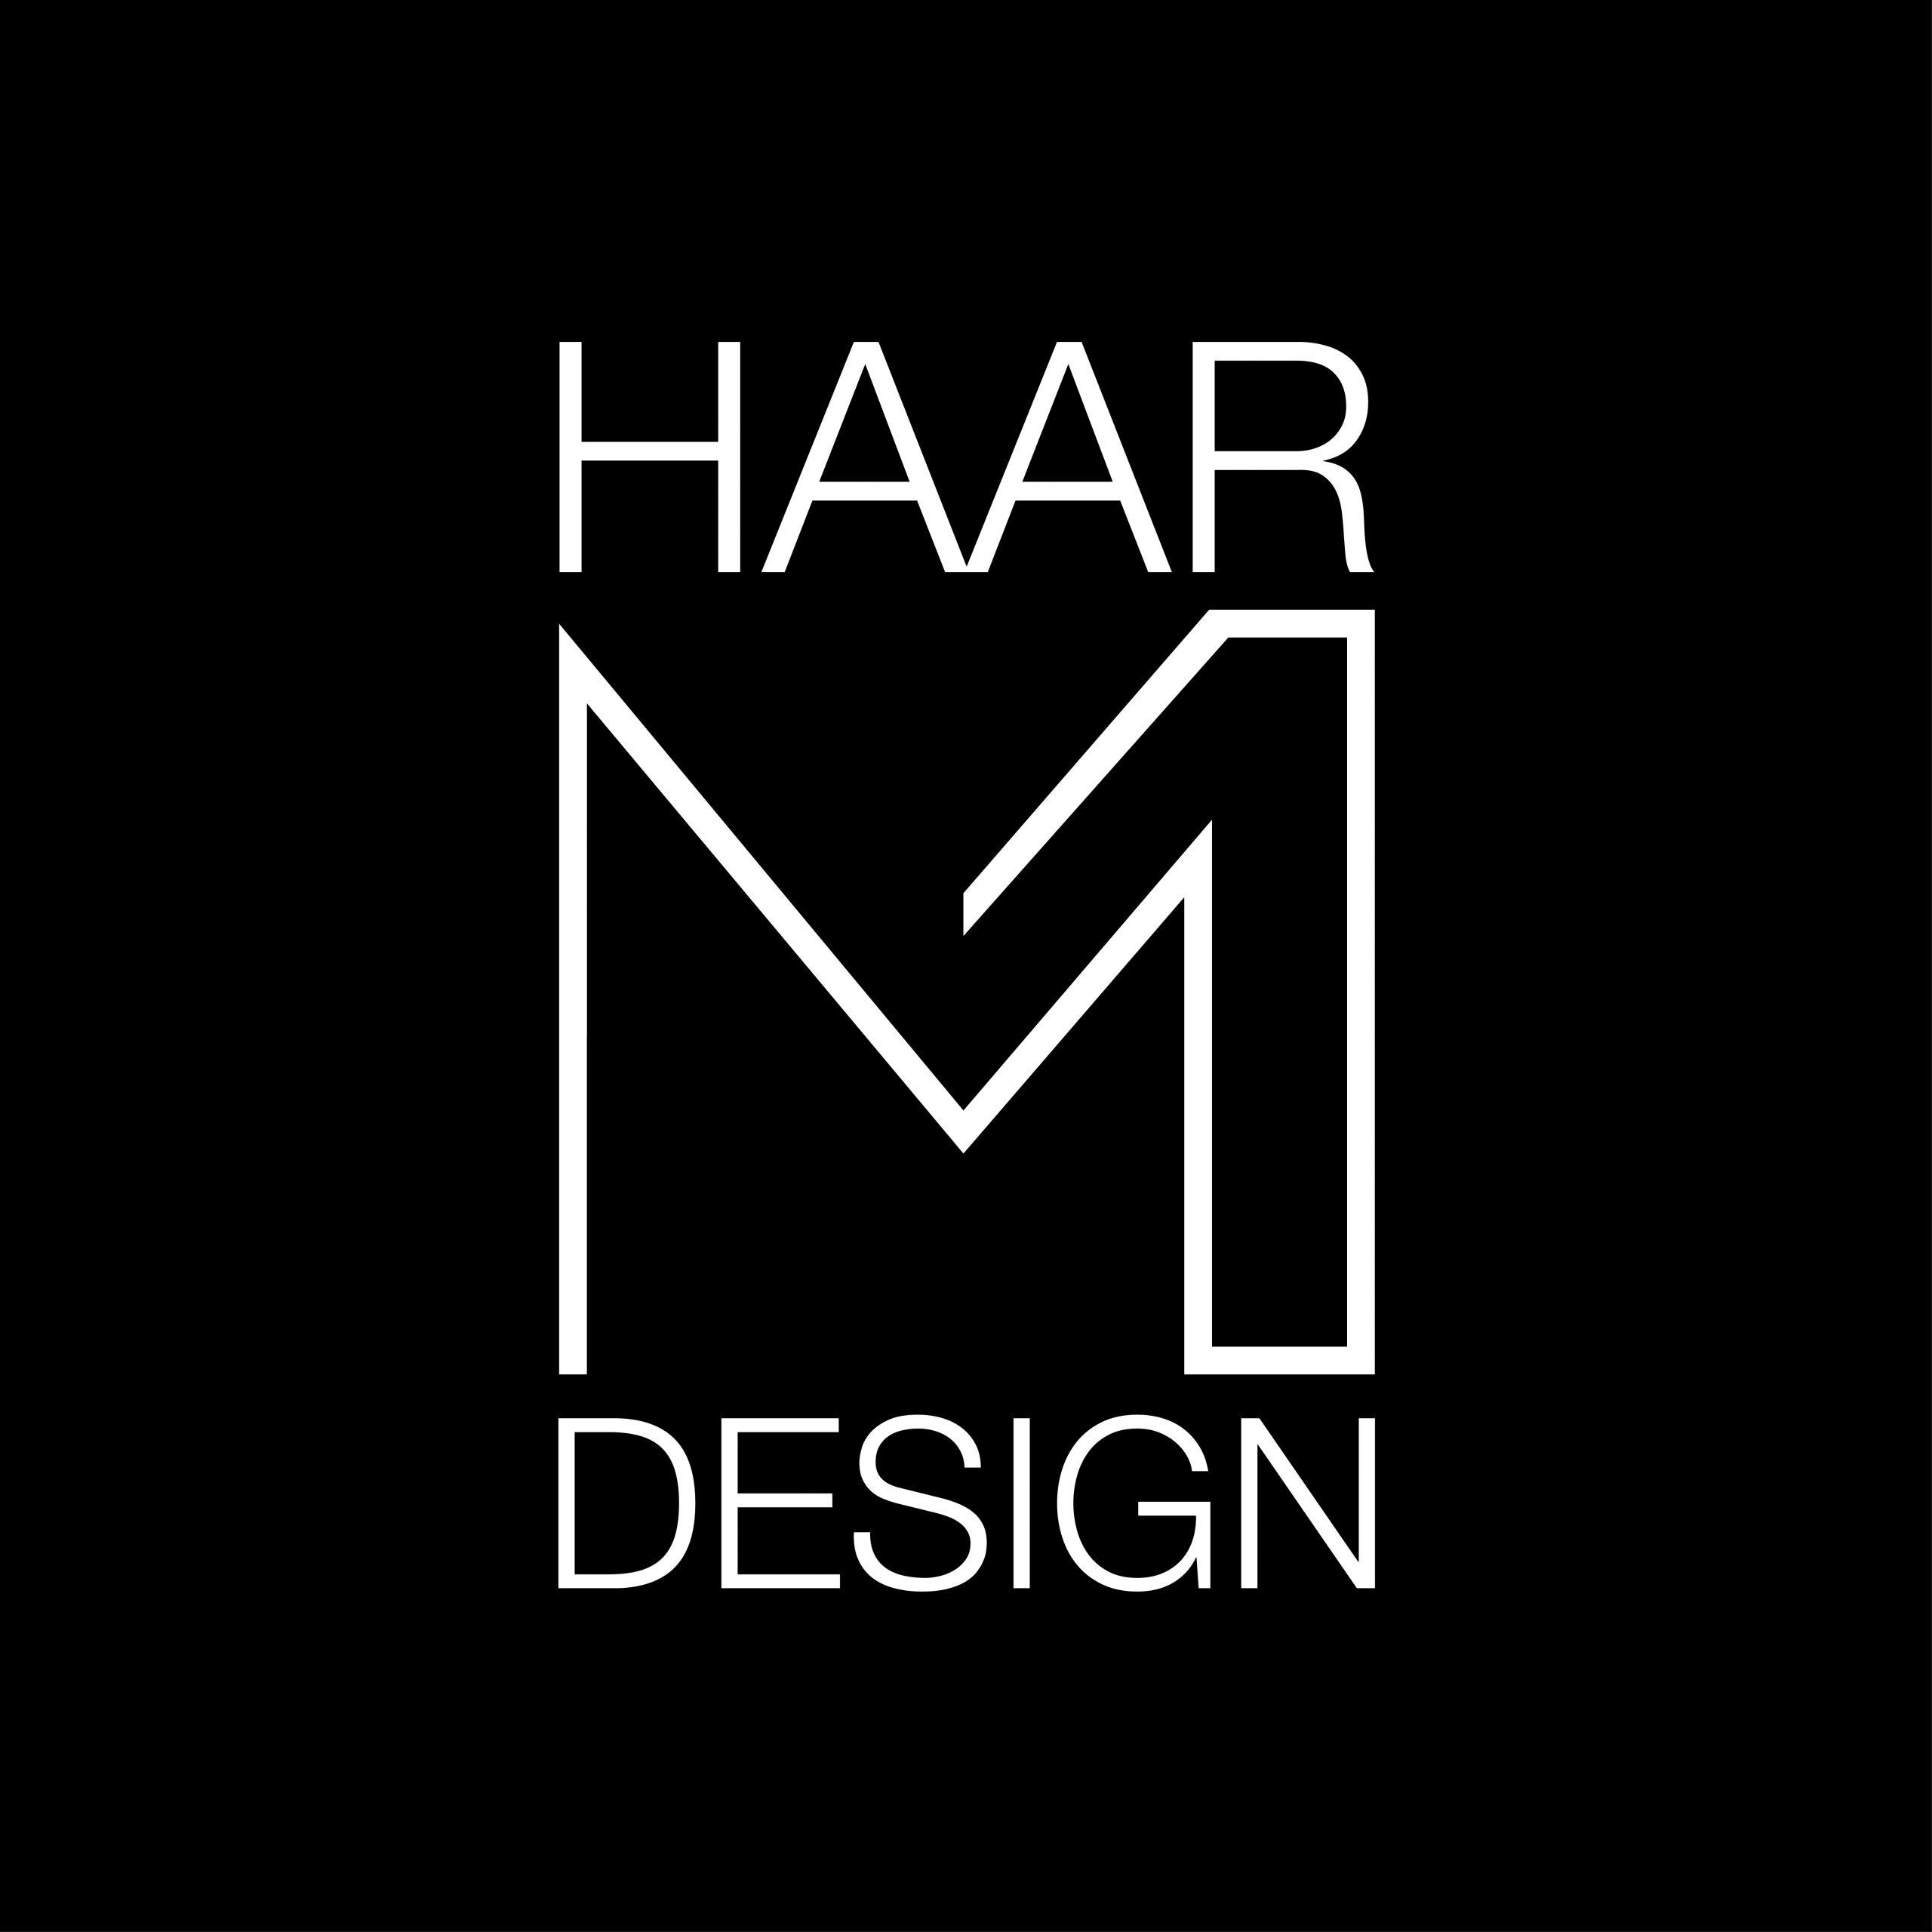 M1 Haardesign